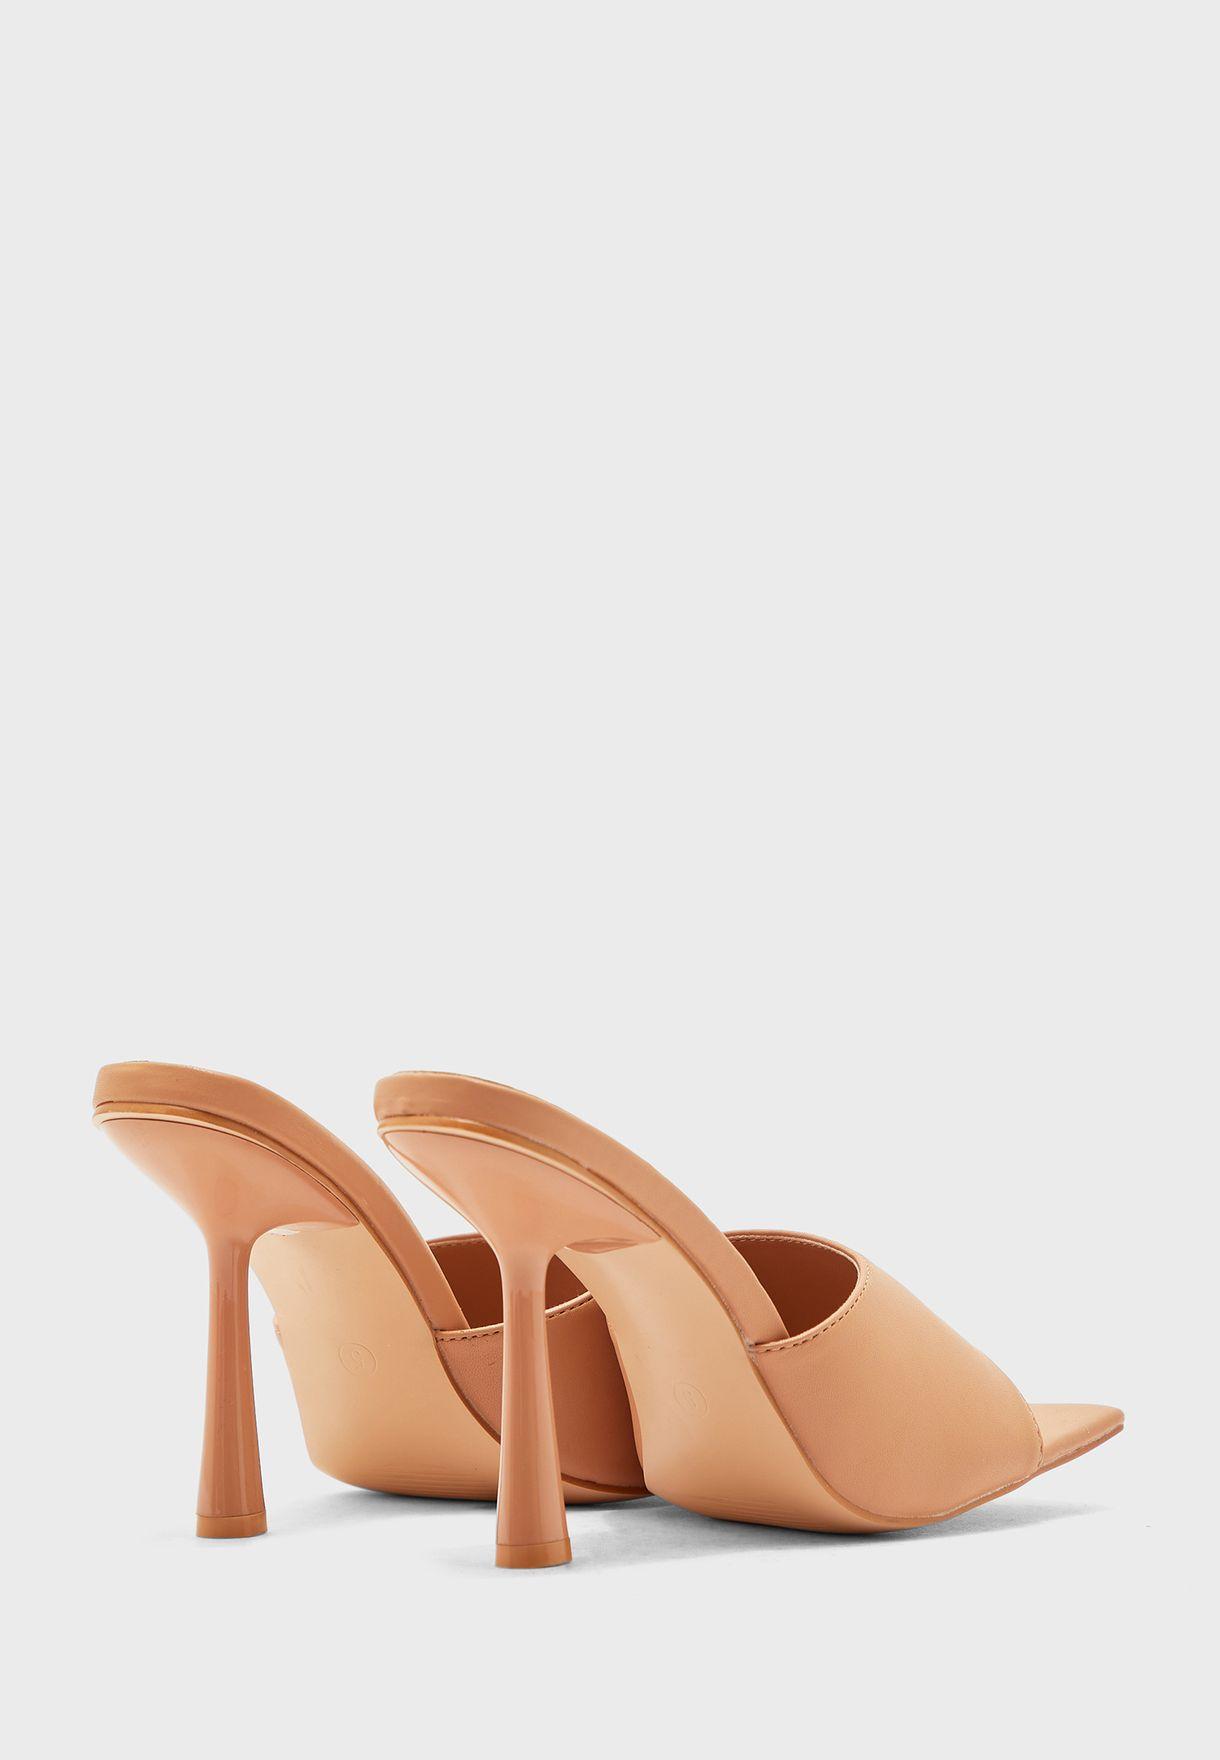 Sweeter High Heel Sandal